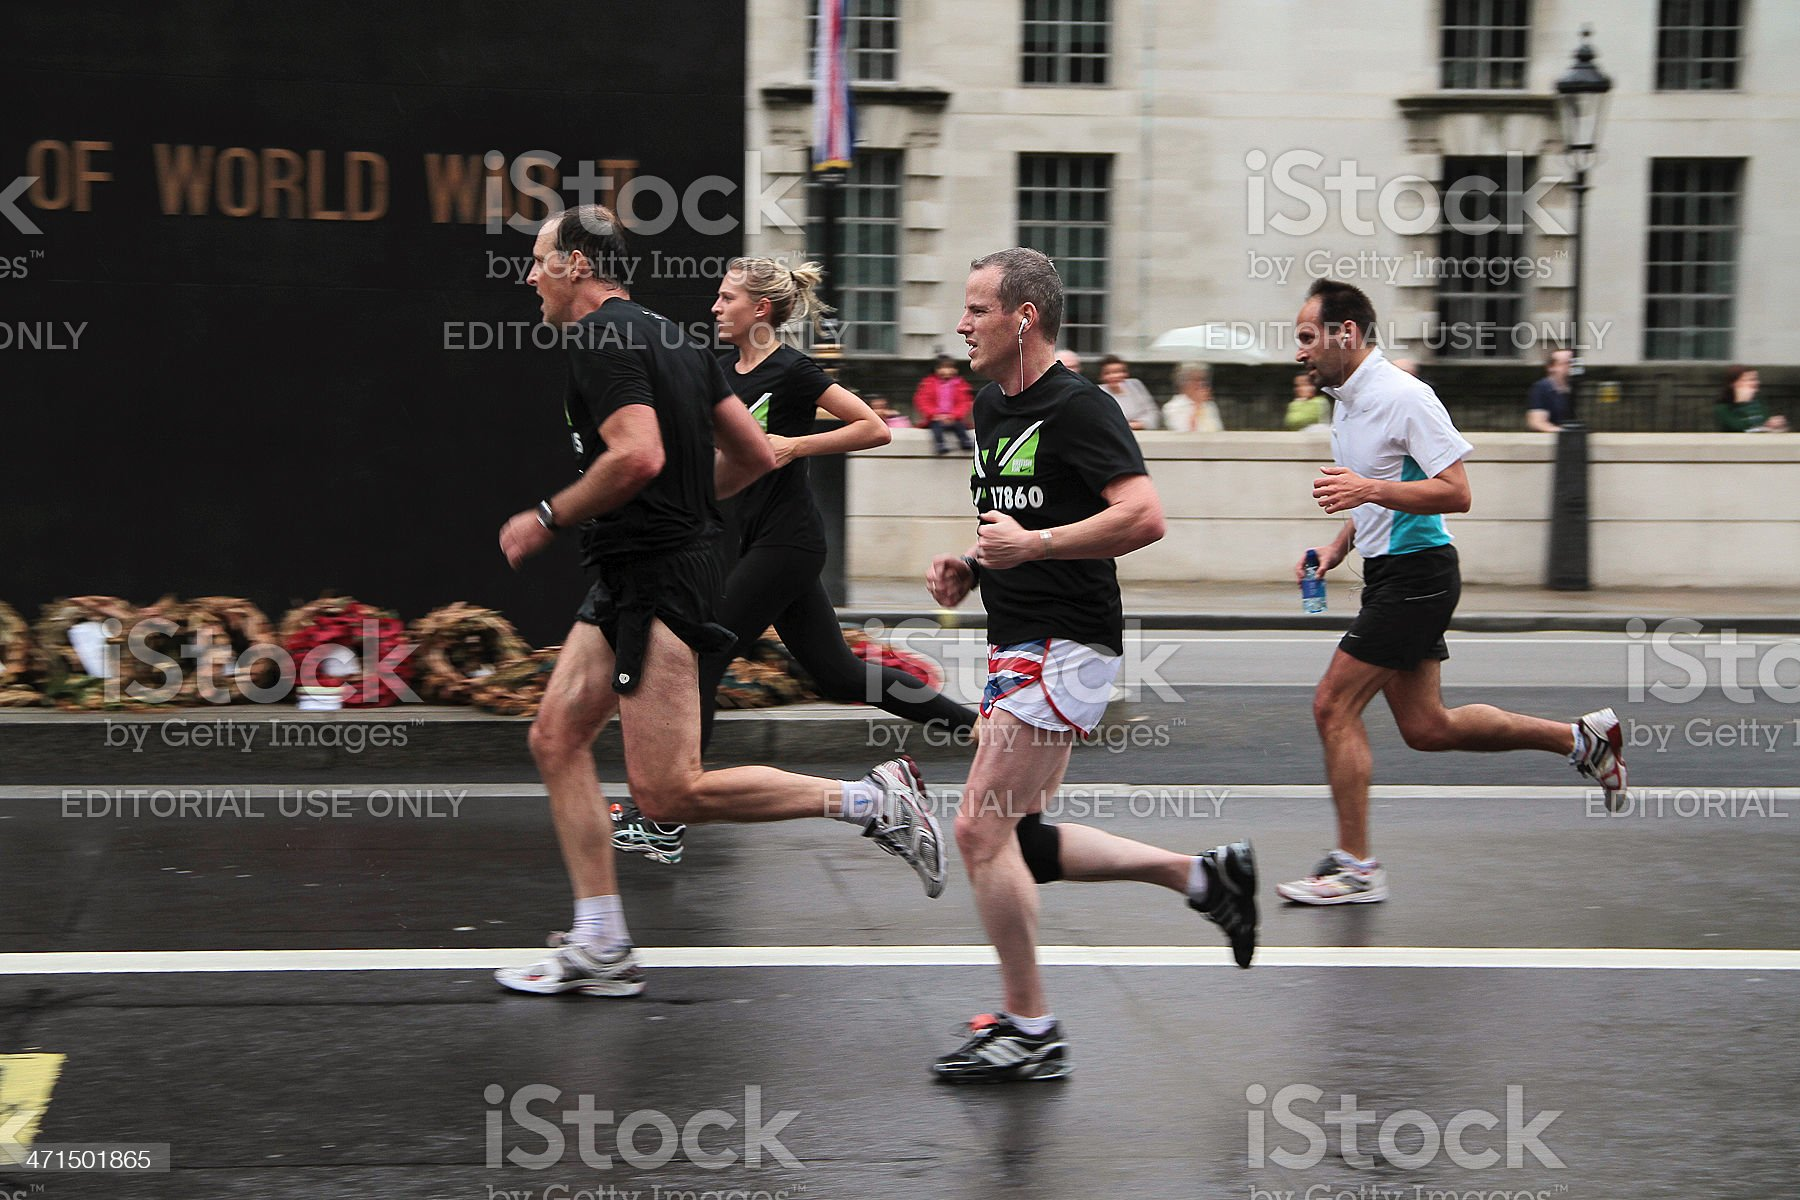 Runners at the 2012 London 10k Marathon royalty-free stock photo